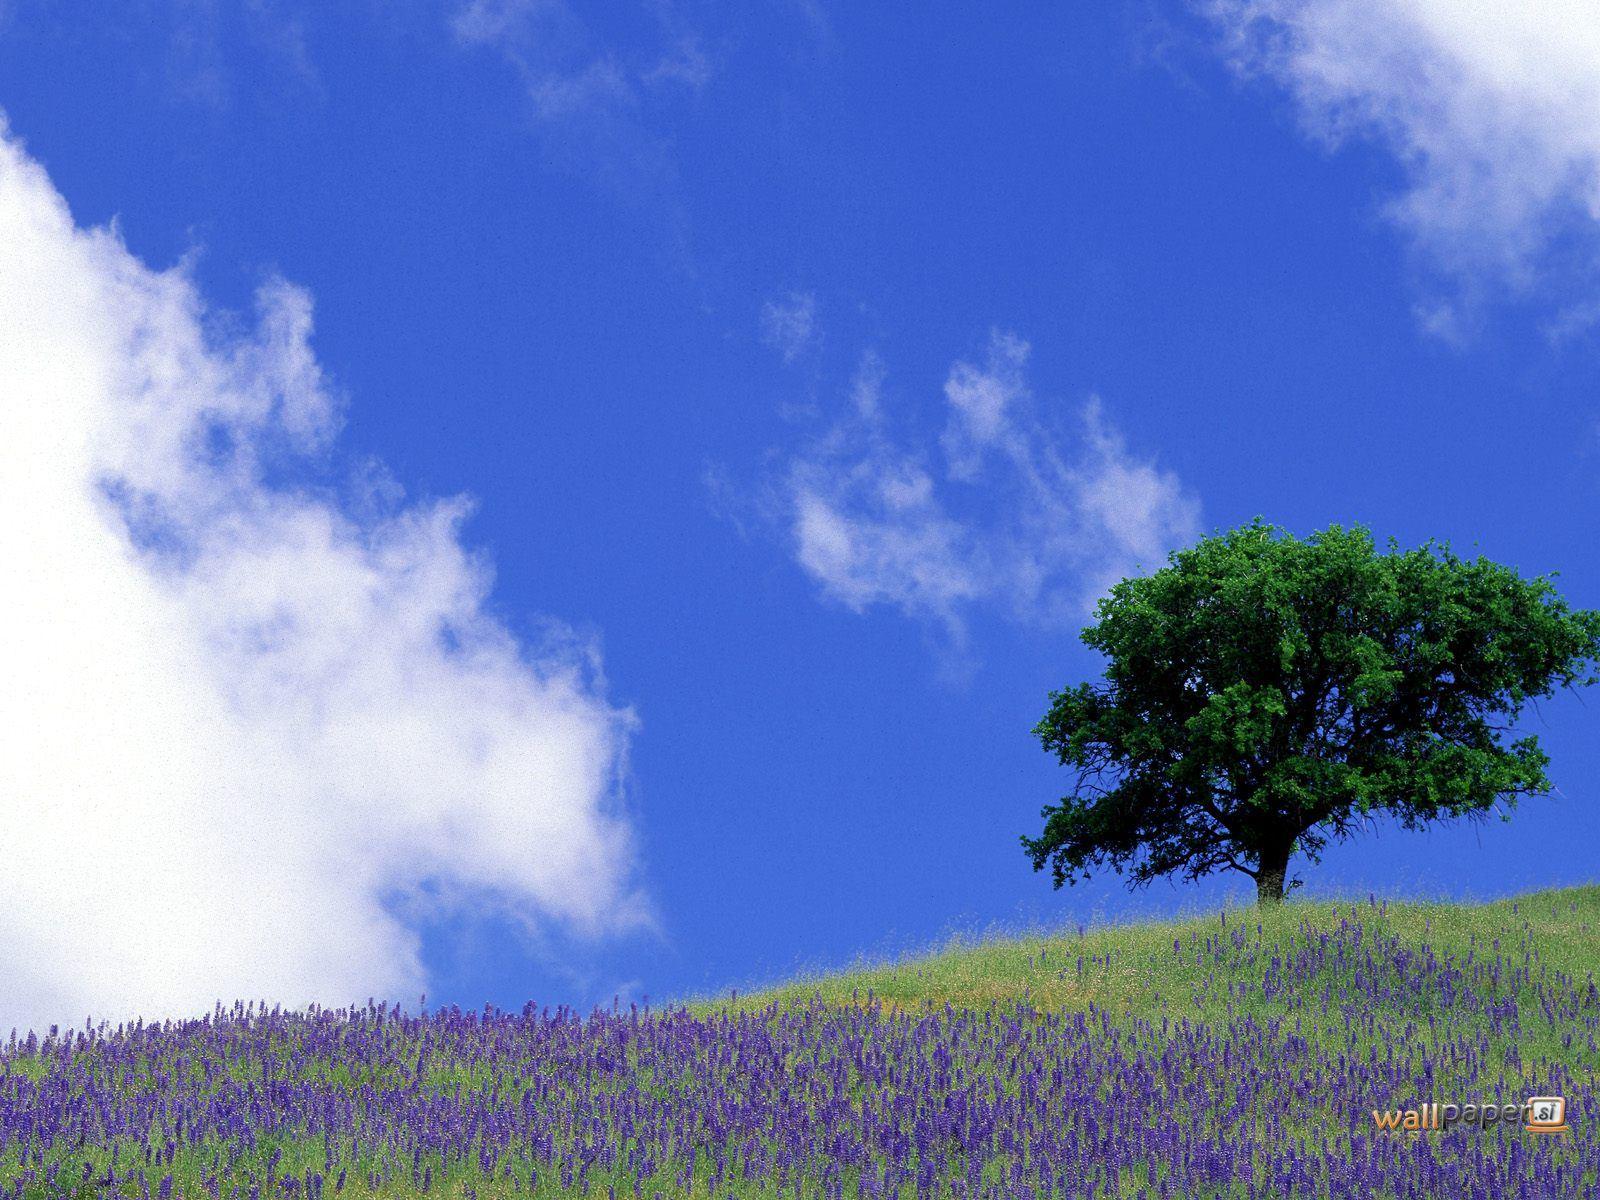 http://4.bp.blogspot.com/-bcftk2pdTGU/TsNJnkkMSXI/AAAAAAAAAhs/716HszwyLKE/s1600/Tranquil-Field-Sierra-Nevada-Foothills-California-Wallpaper.jpg